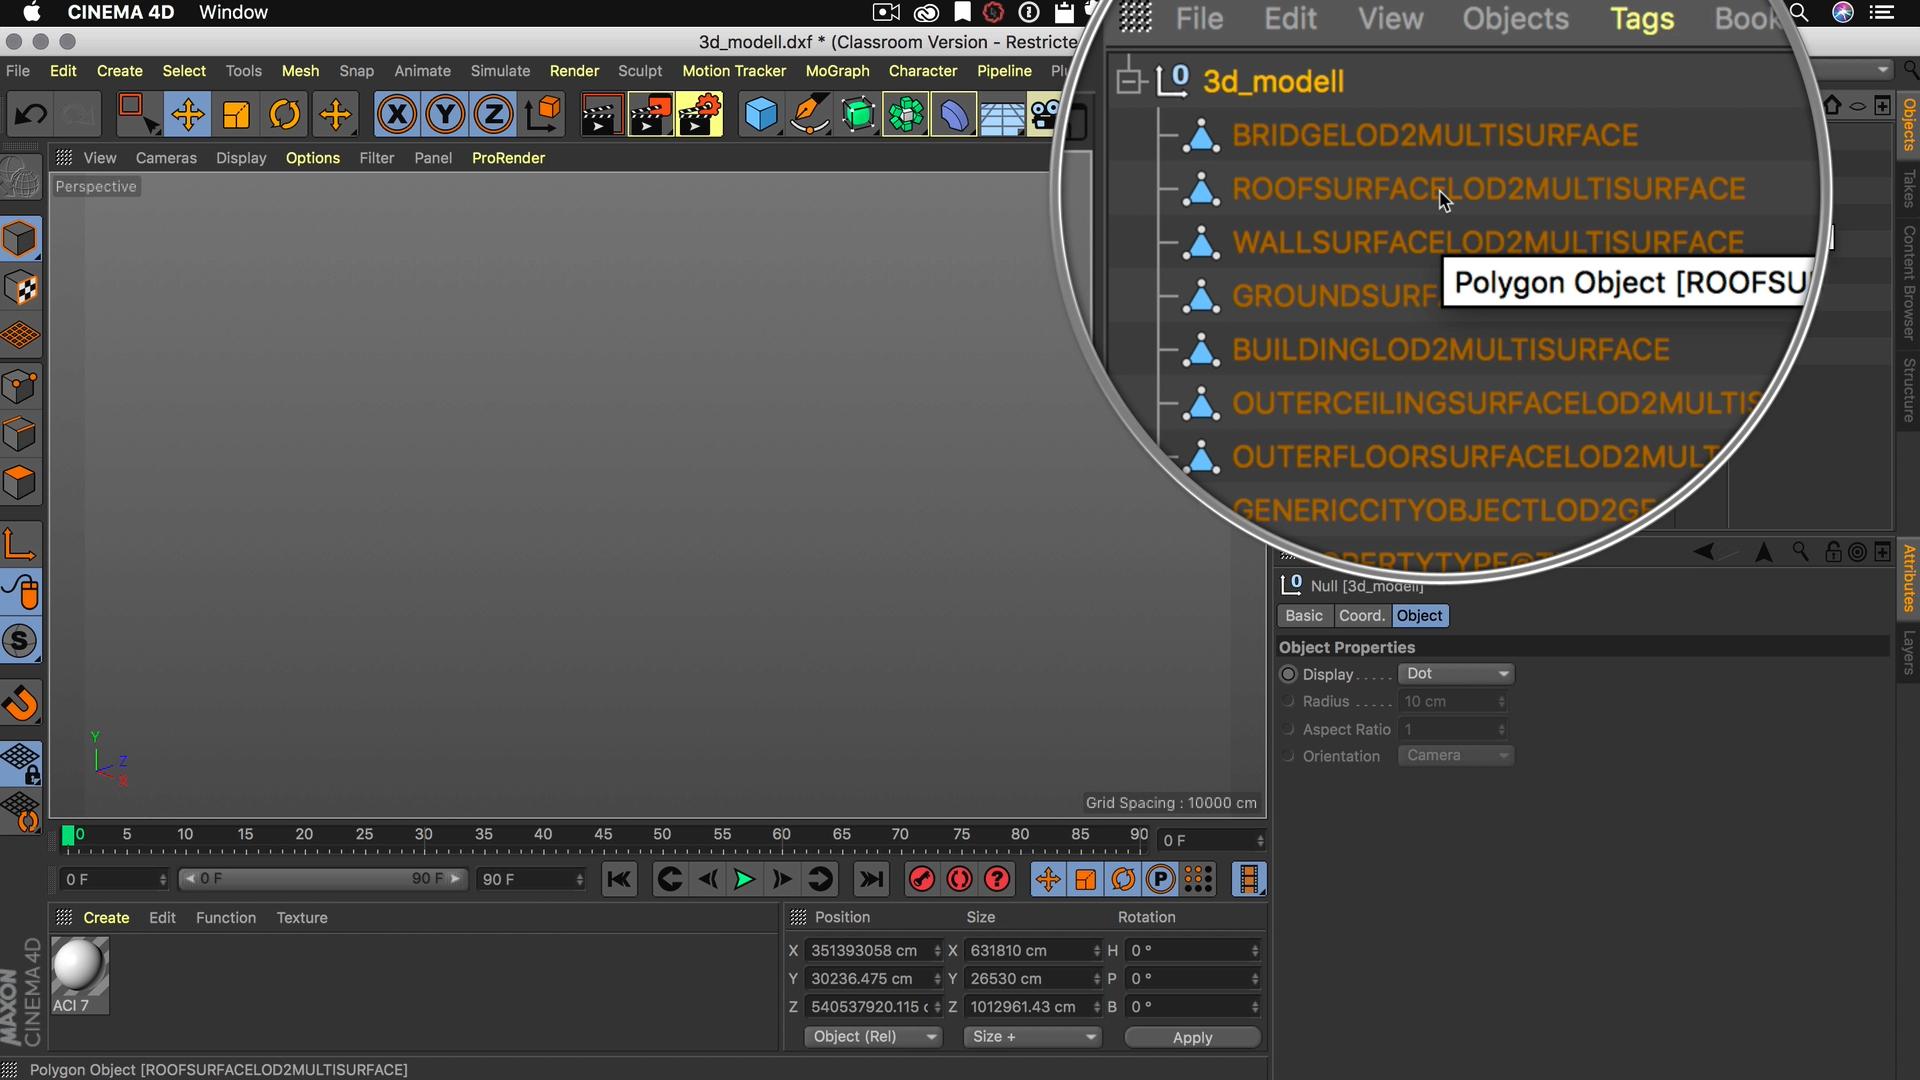 Cinema4D 3D-Stadtmodell Import DXF unsichtbar im Editor